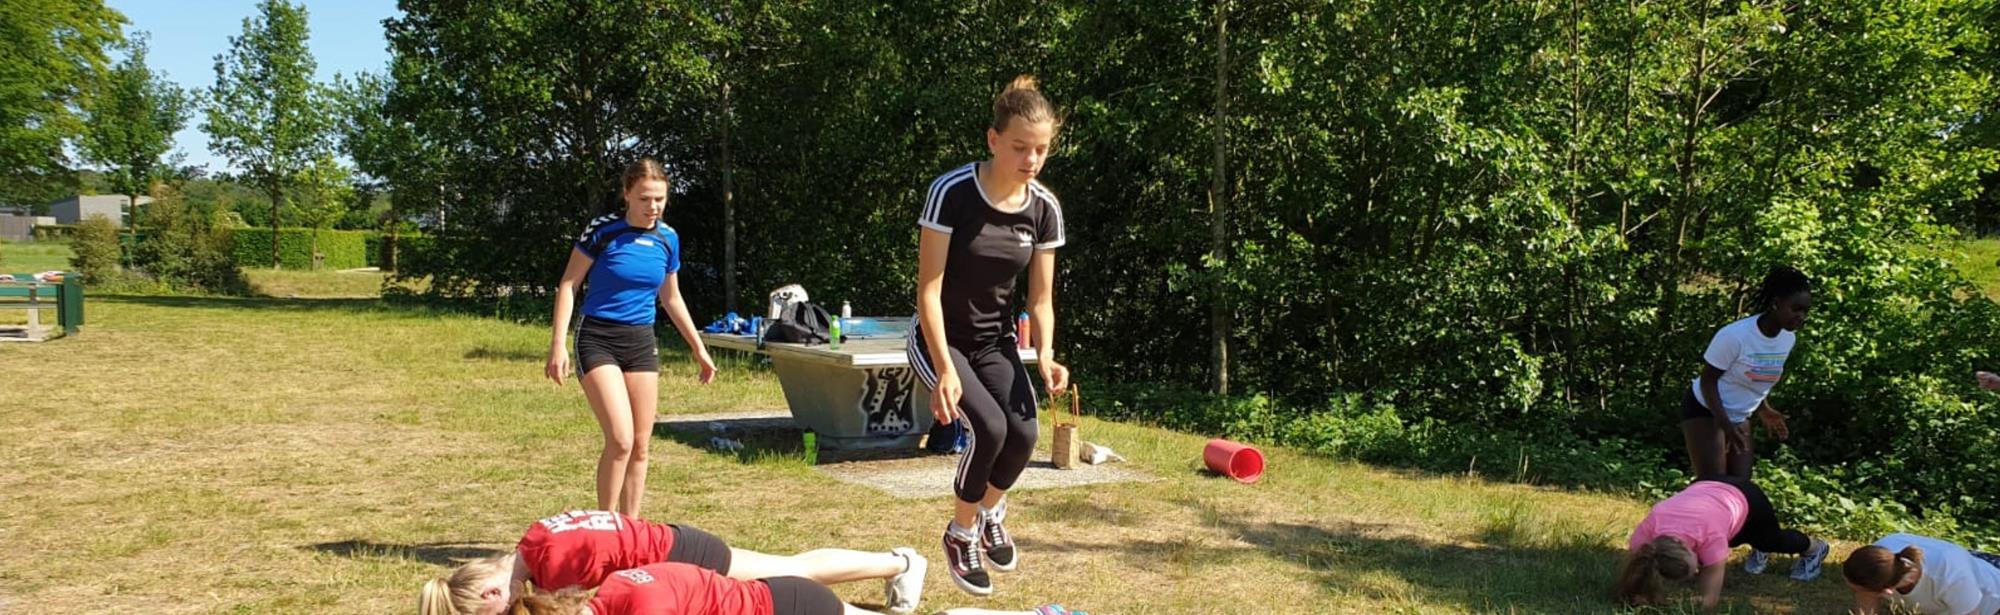 Mosaqua sportweek voor Kids